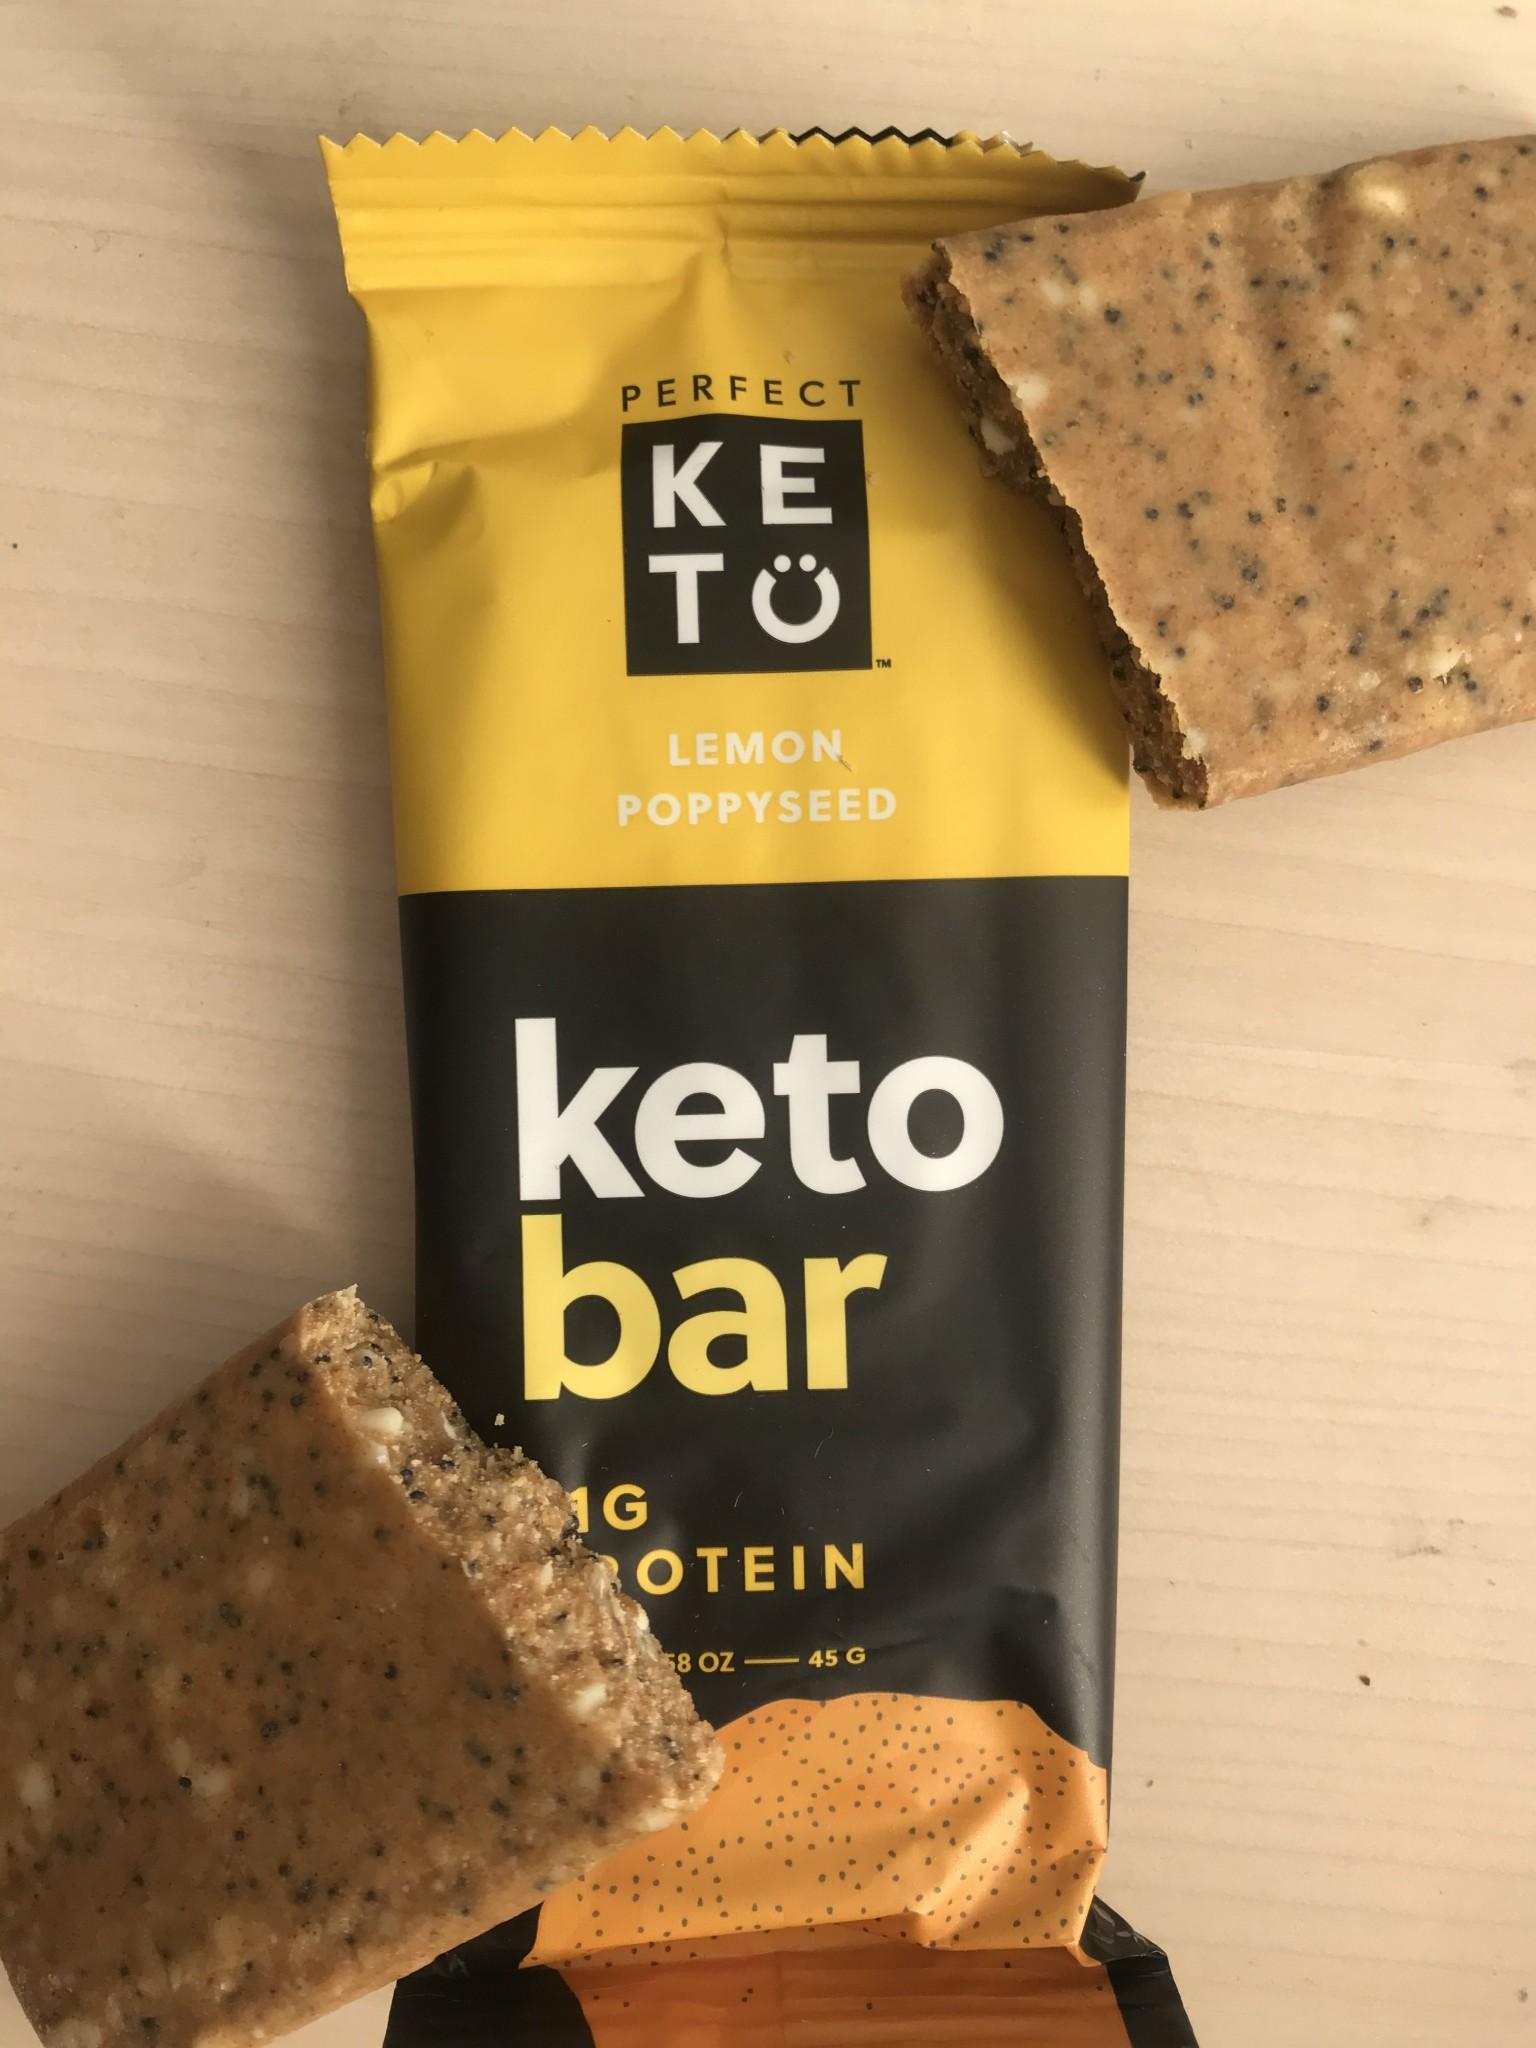 barre cétogène perfect keto citron pavot